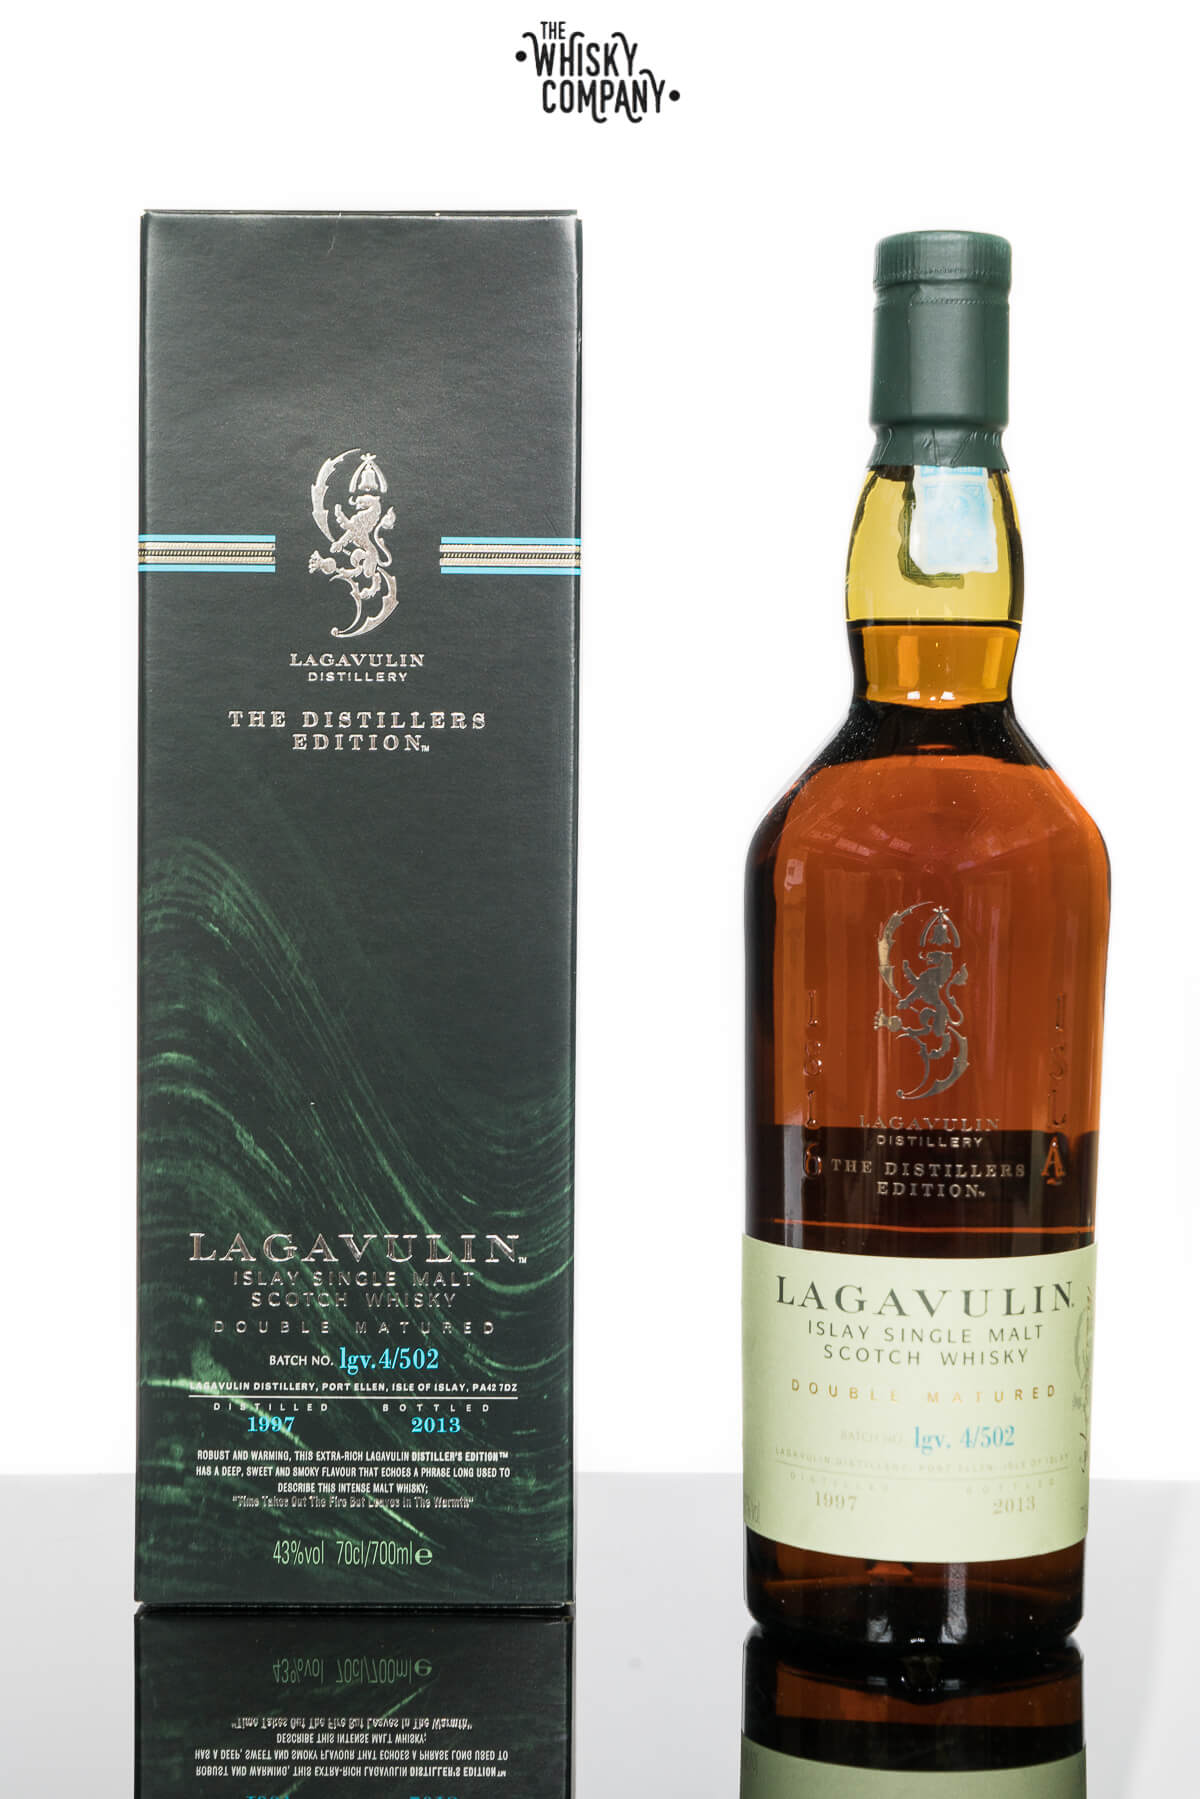 Lagavulin 1997 (bottled 2013) Distillers Edition Islay Single Malt Scotch Whisky (700ml)